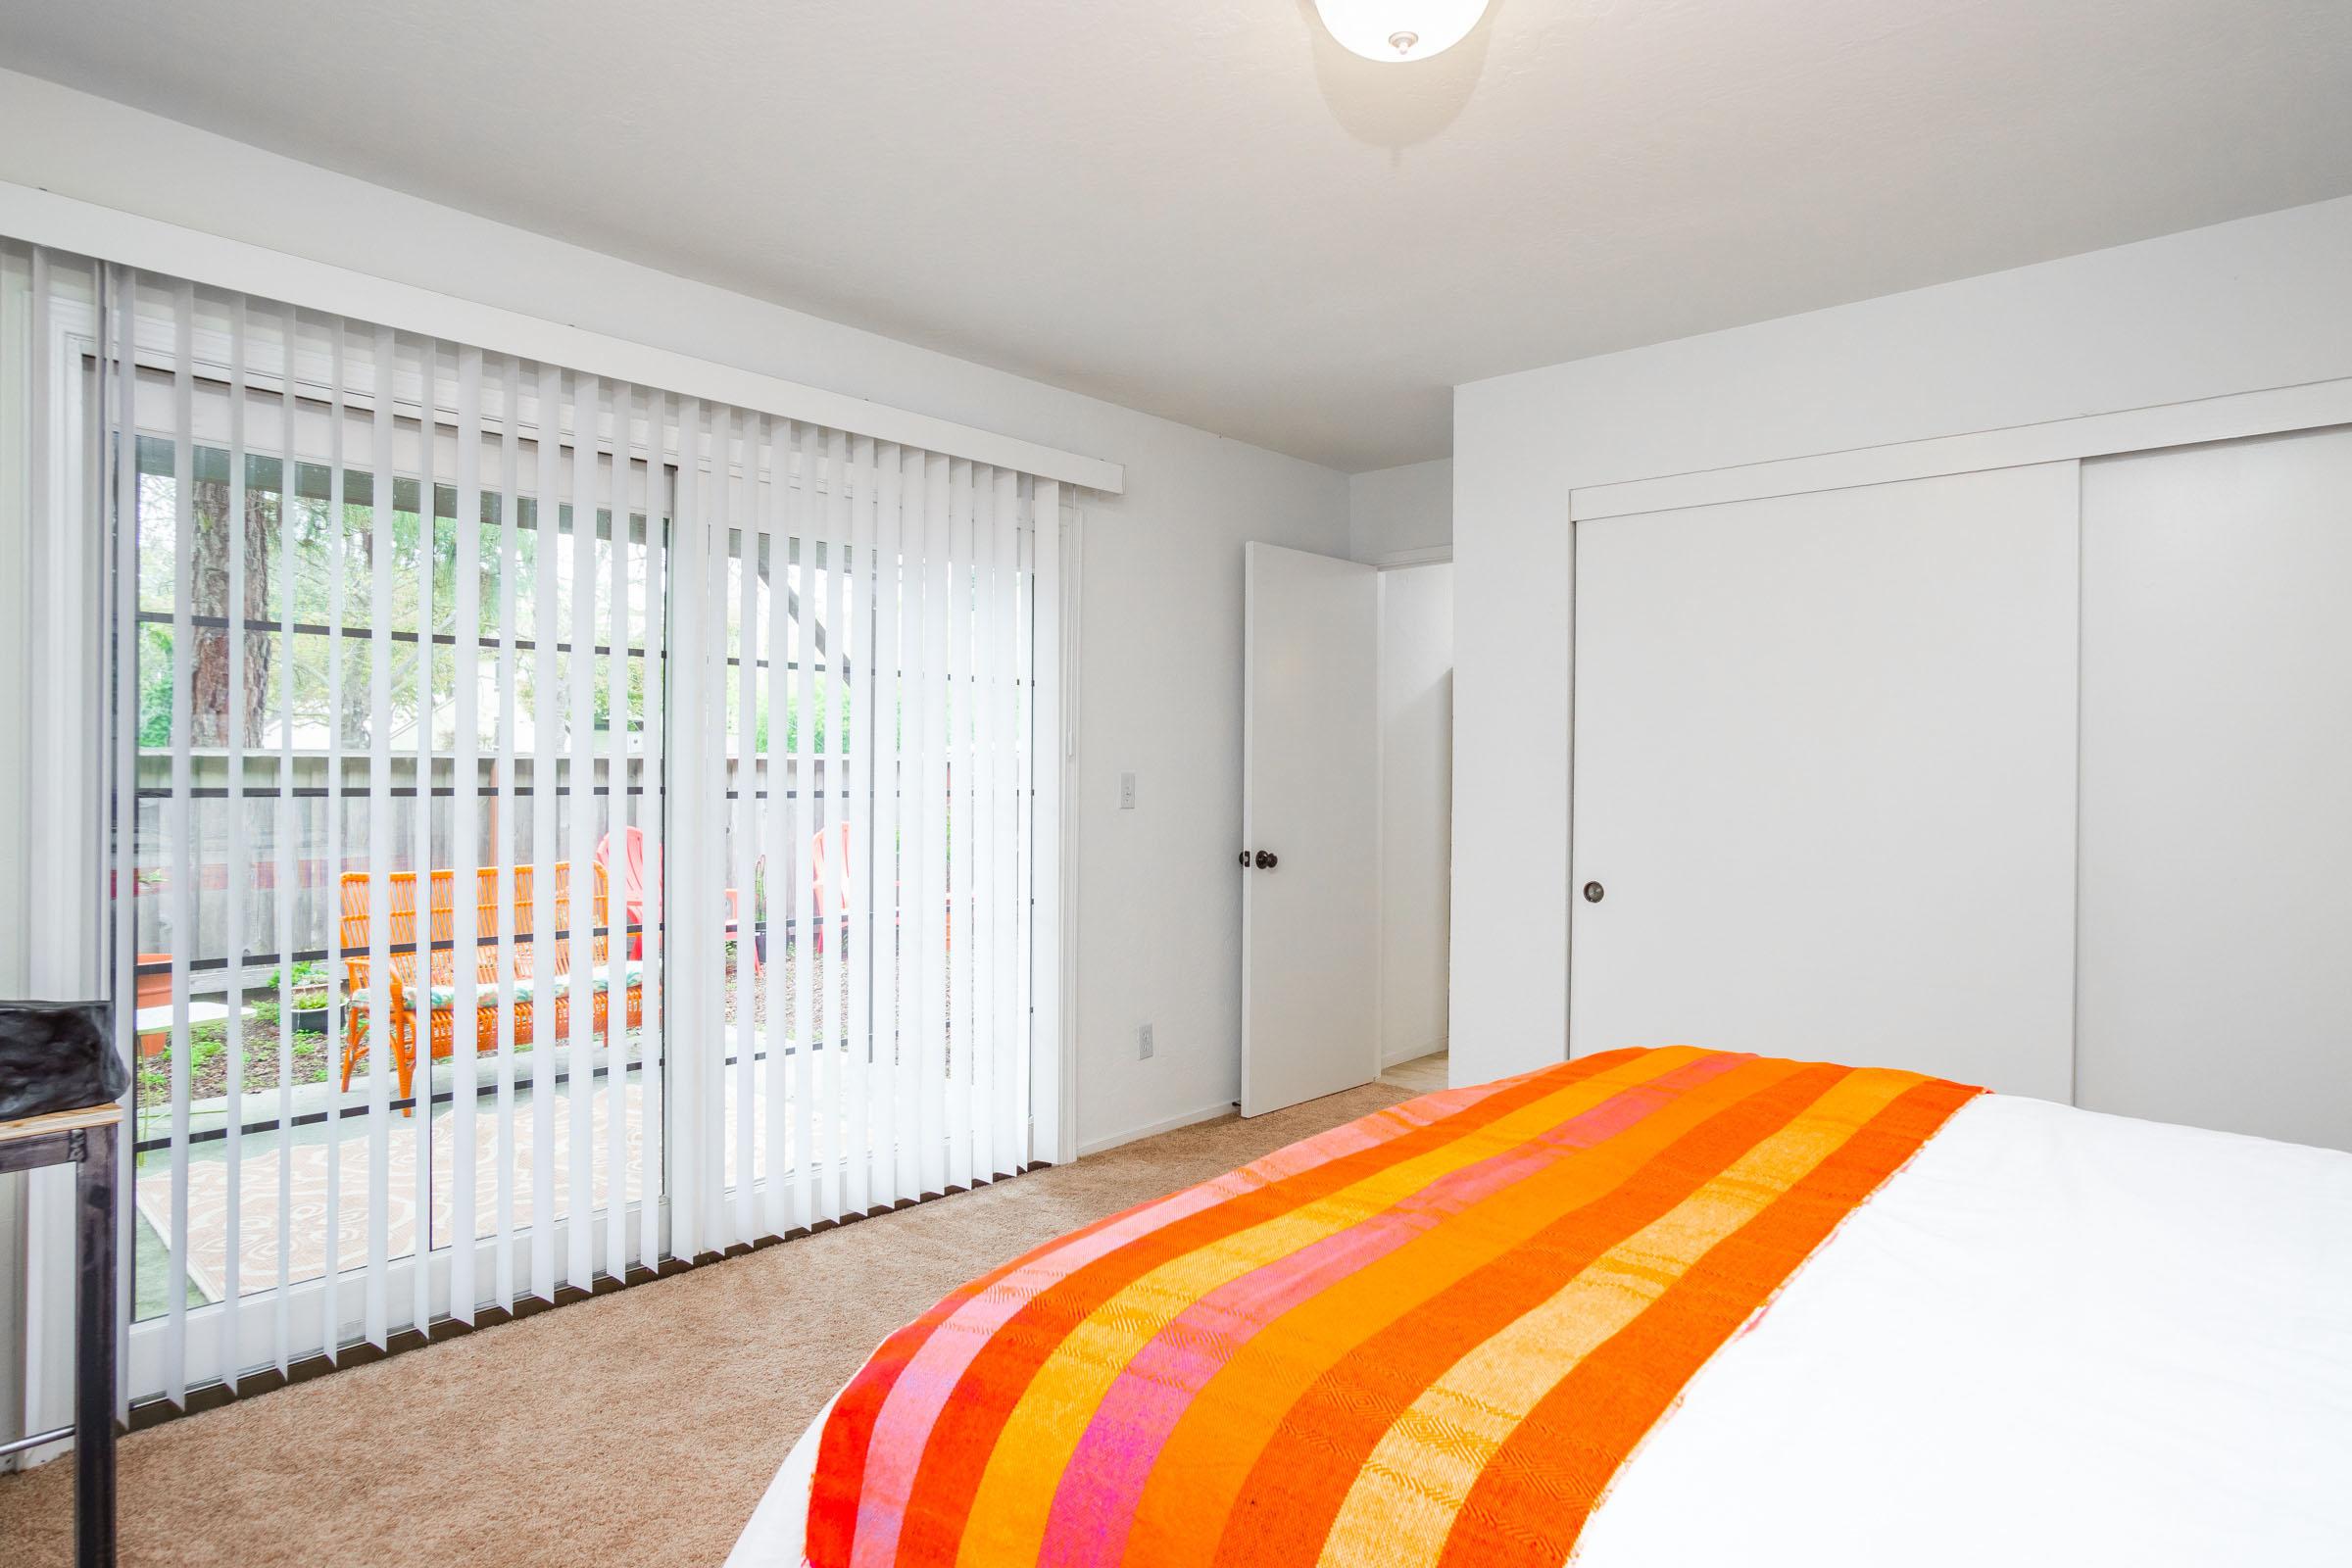 3 Beds Home Garage & Garden In Westside